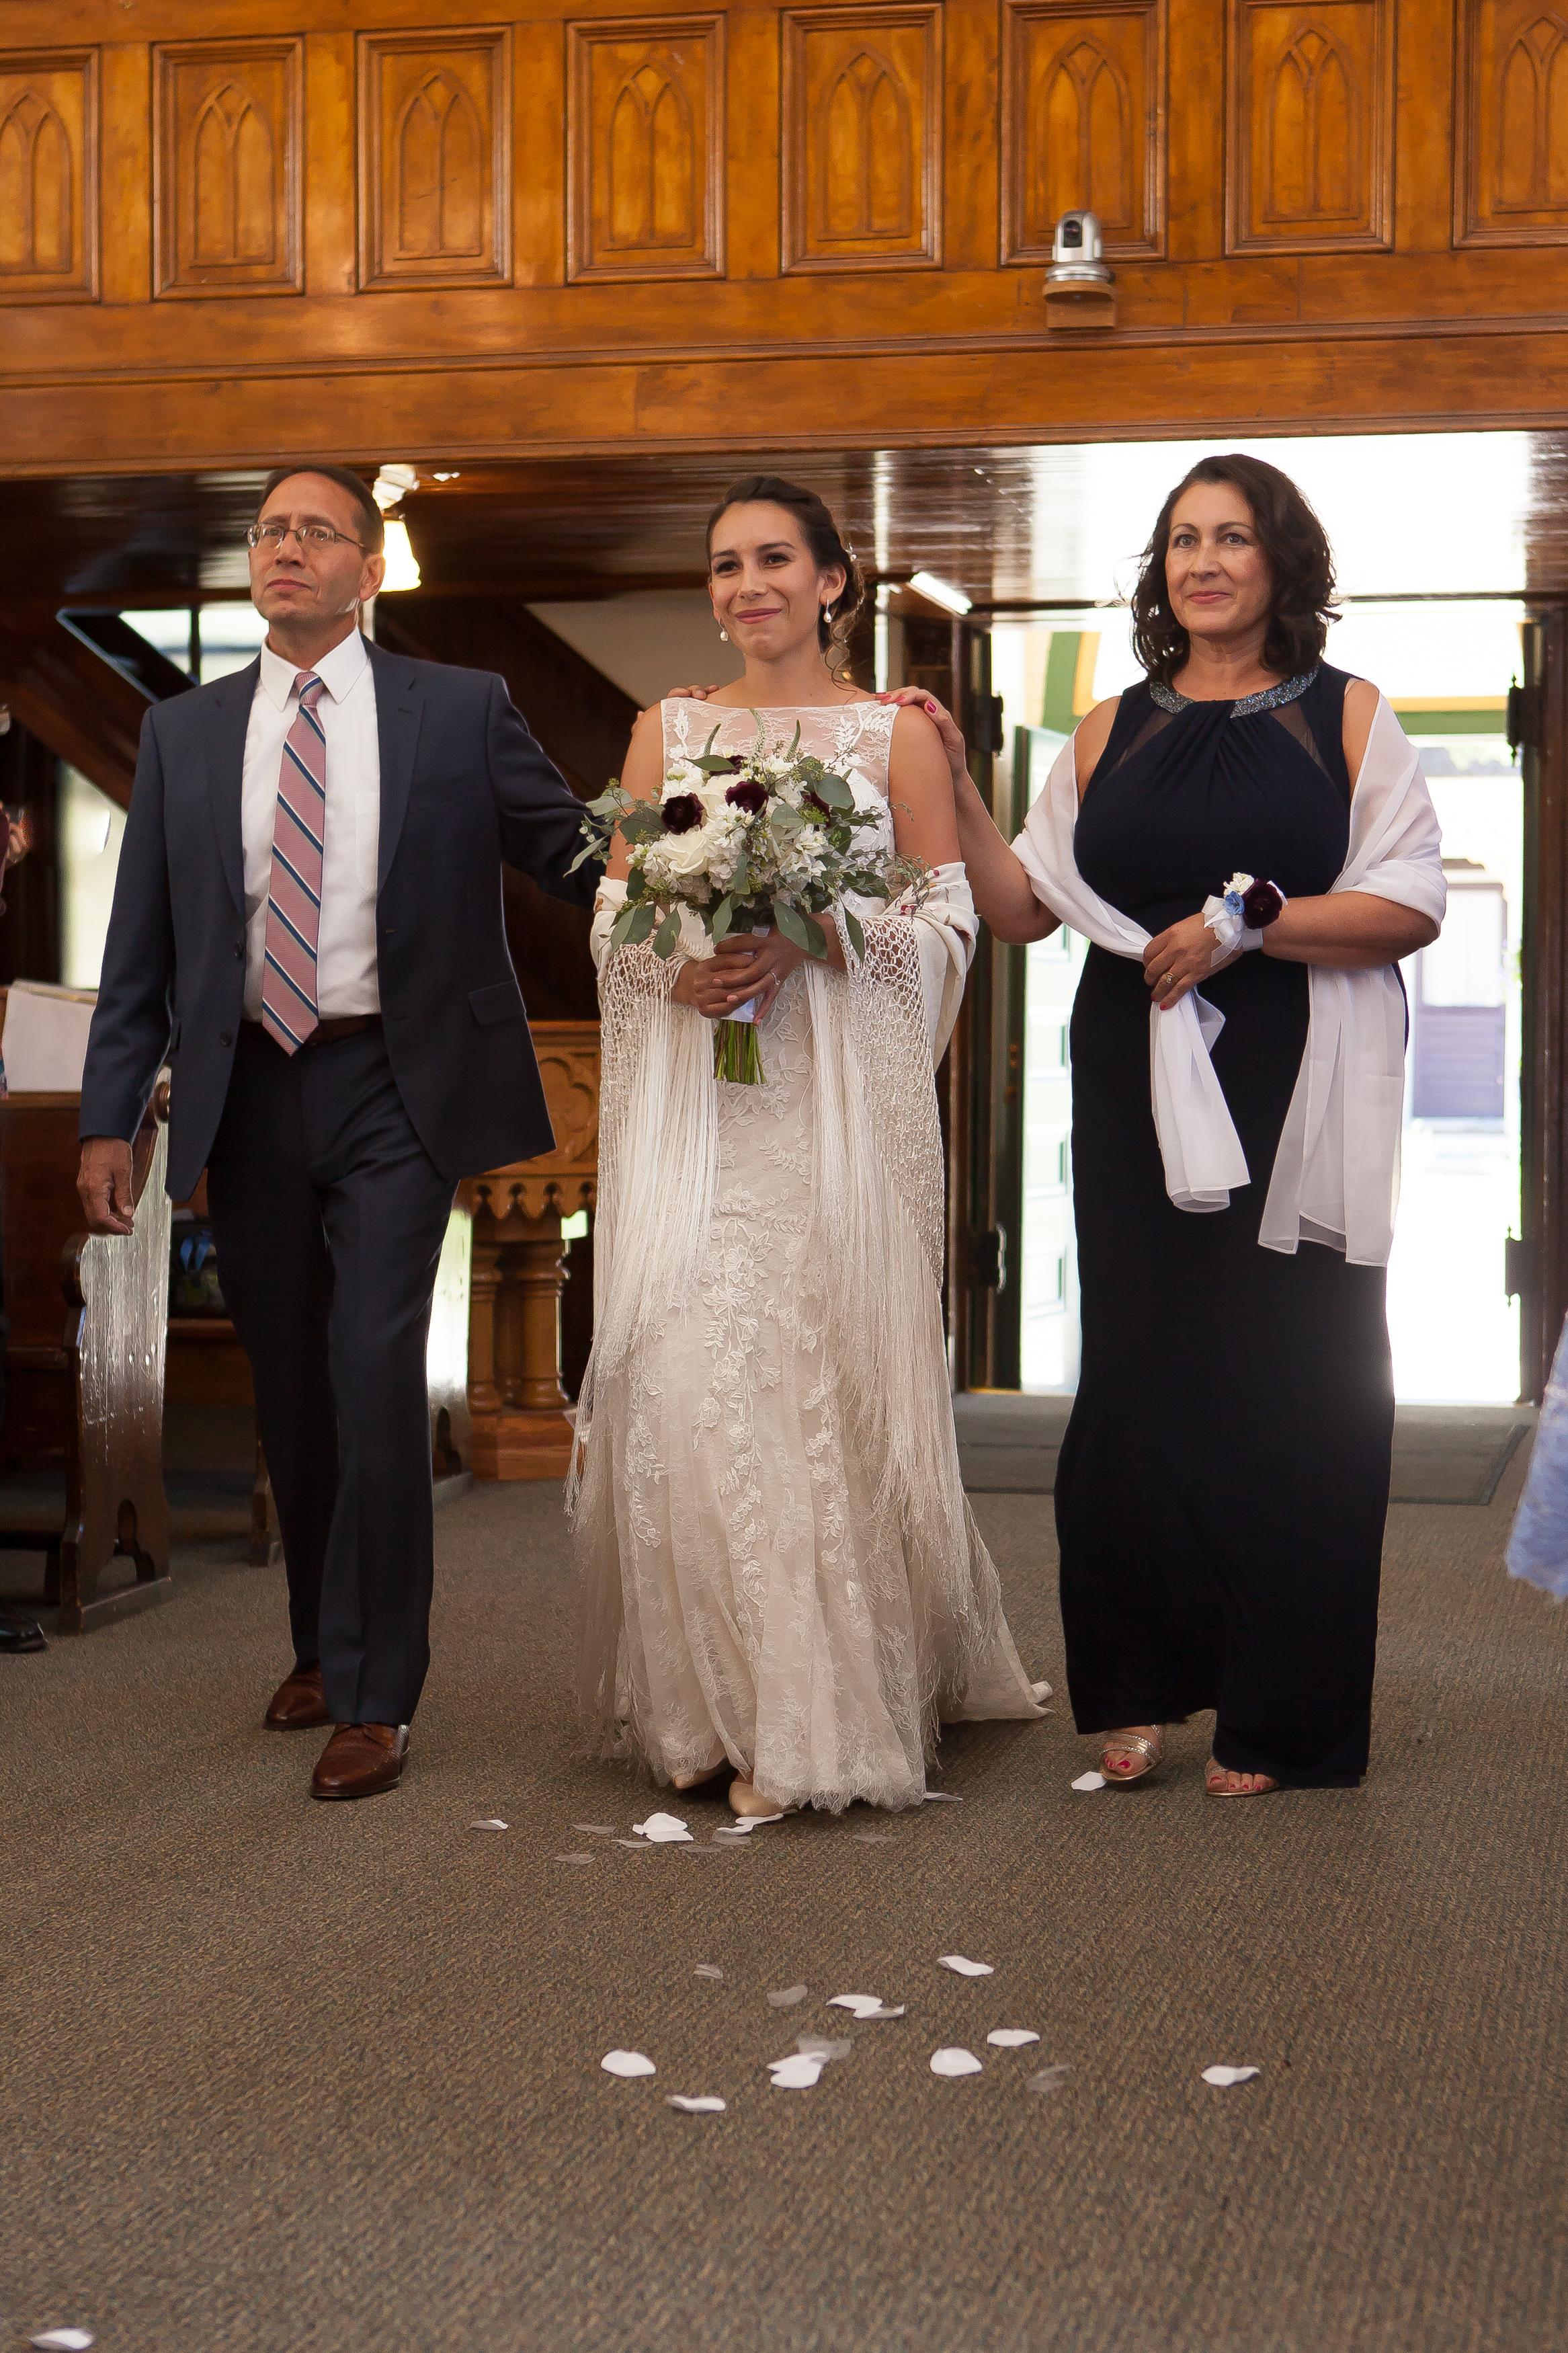 St. Patrick's Catholic Church, Telluride, Colorado and Durango Wedding Photographers Alexi Hubbell Photography